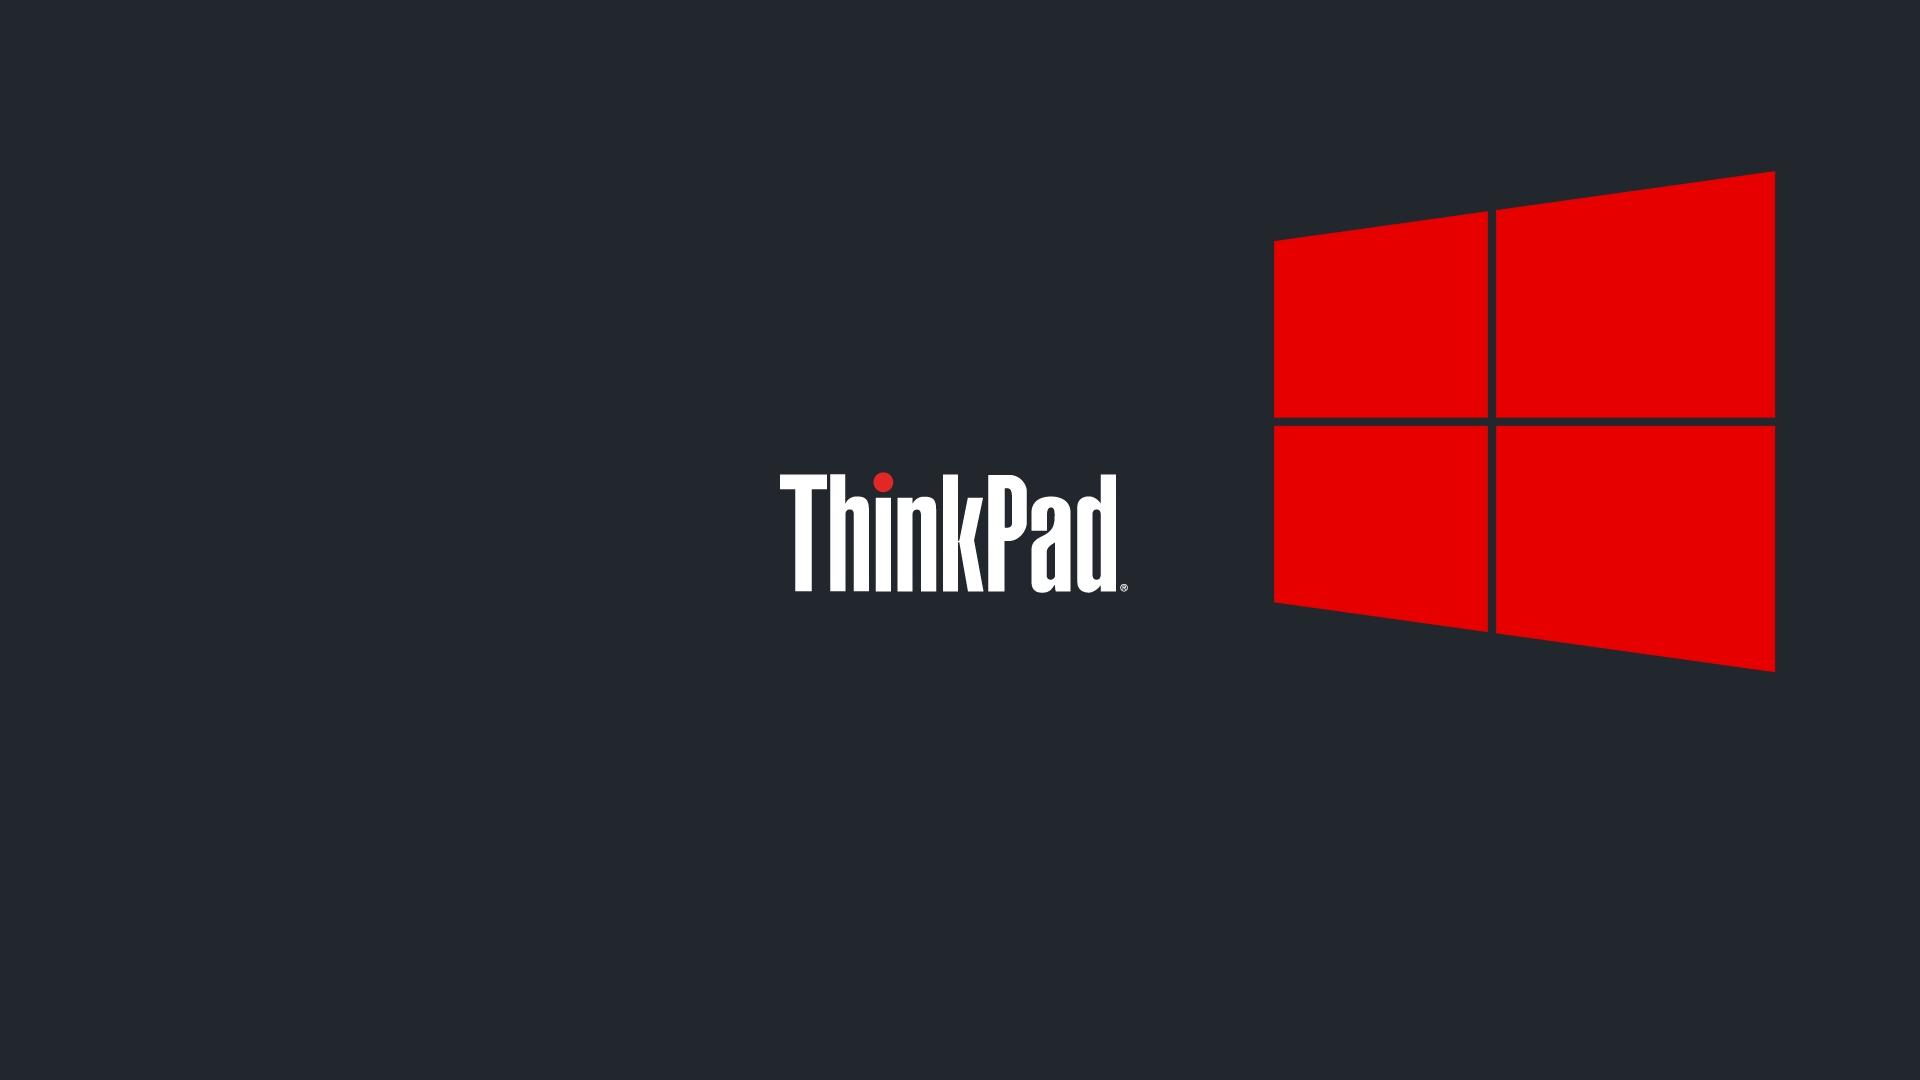 Thinkpad Wallpaper Posted By John Thompson